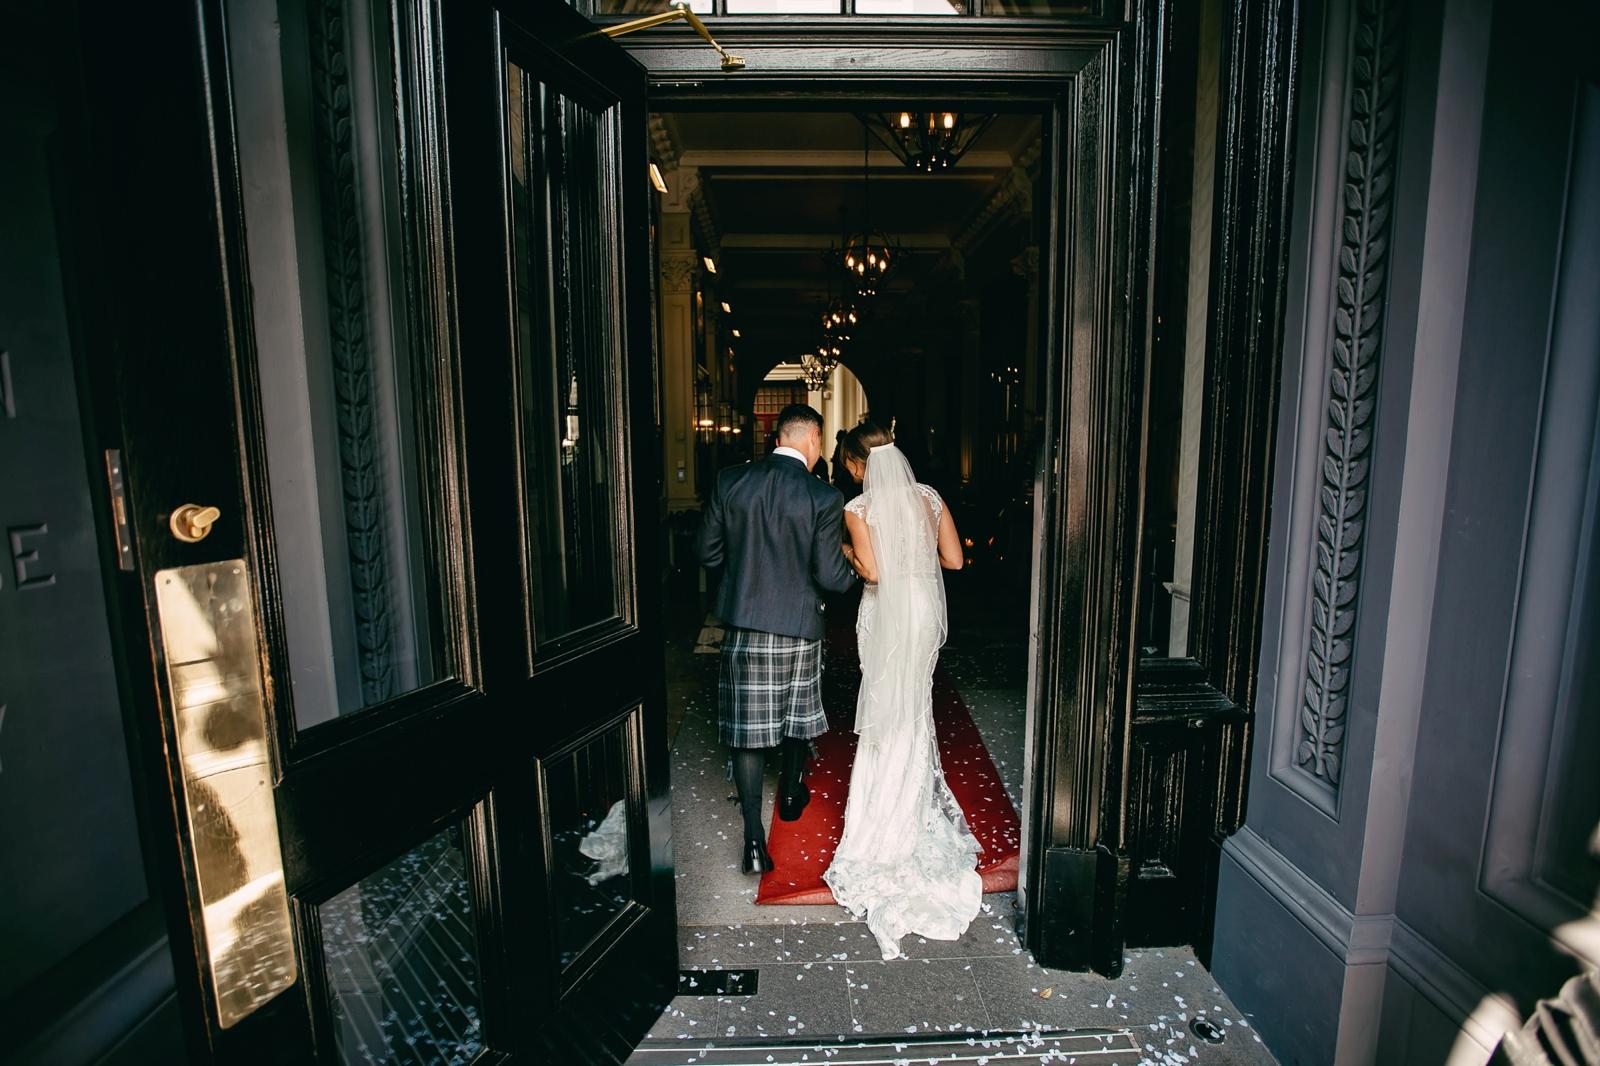 070-Carla-Dexter-The-Principal-Hotel-George-St-Edinburgh.jpg